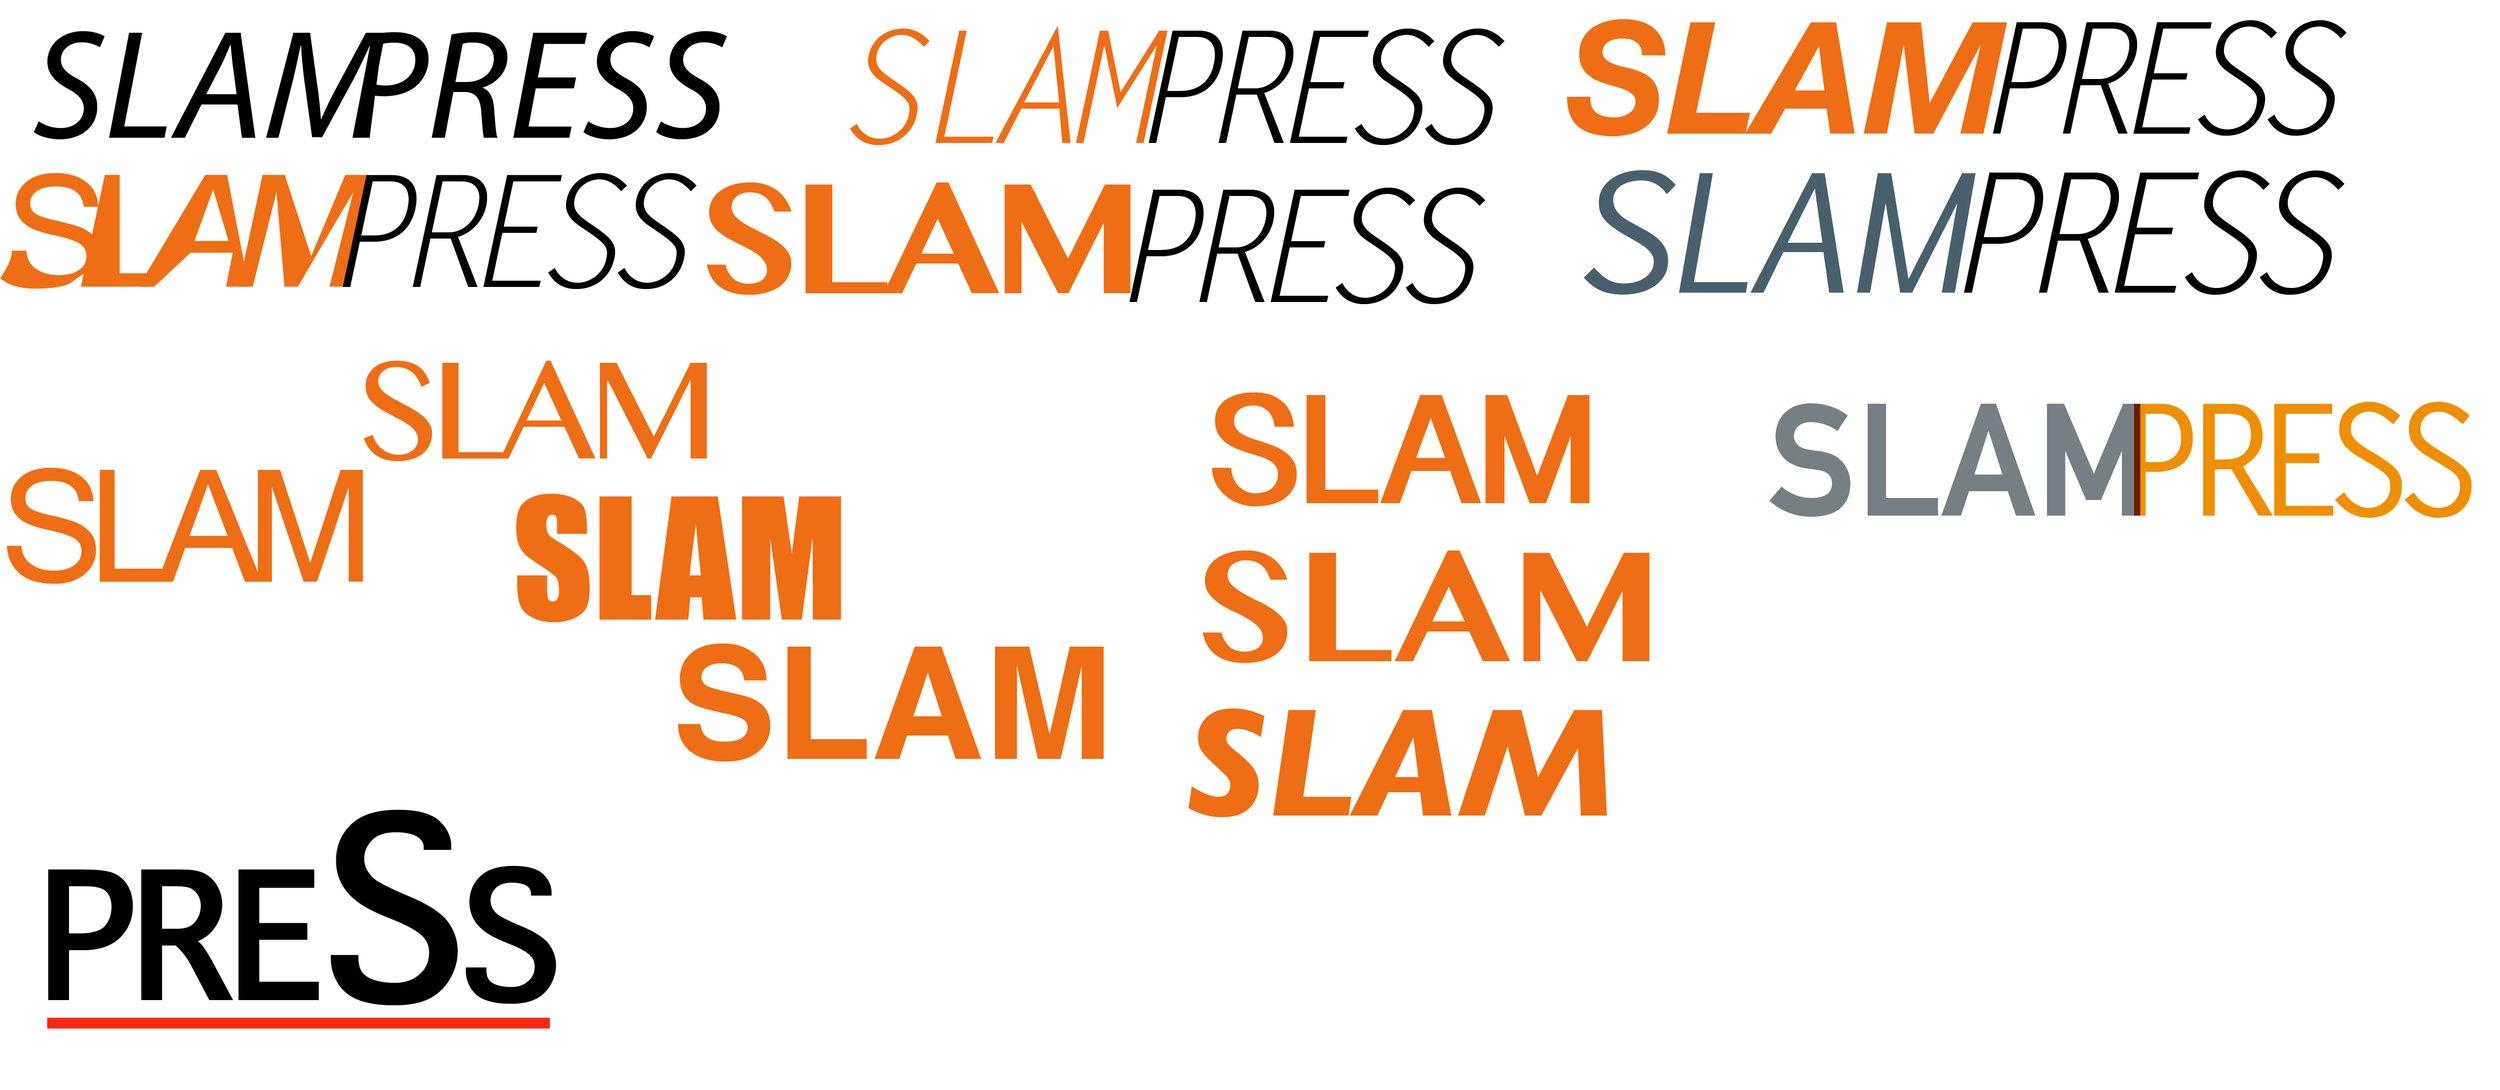 SLAMPRESS LOGO DESIGNS02A.jpg